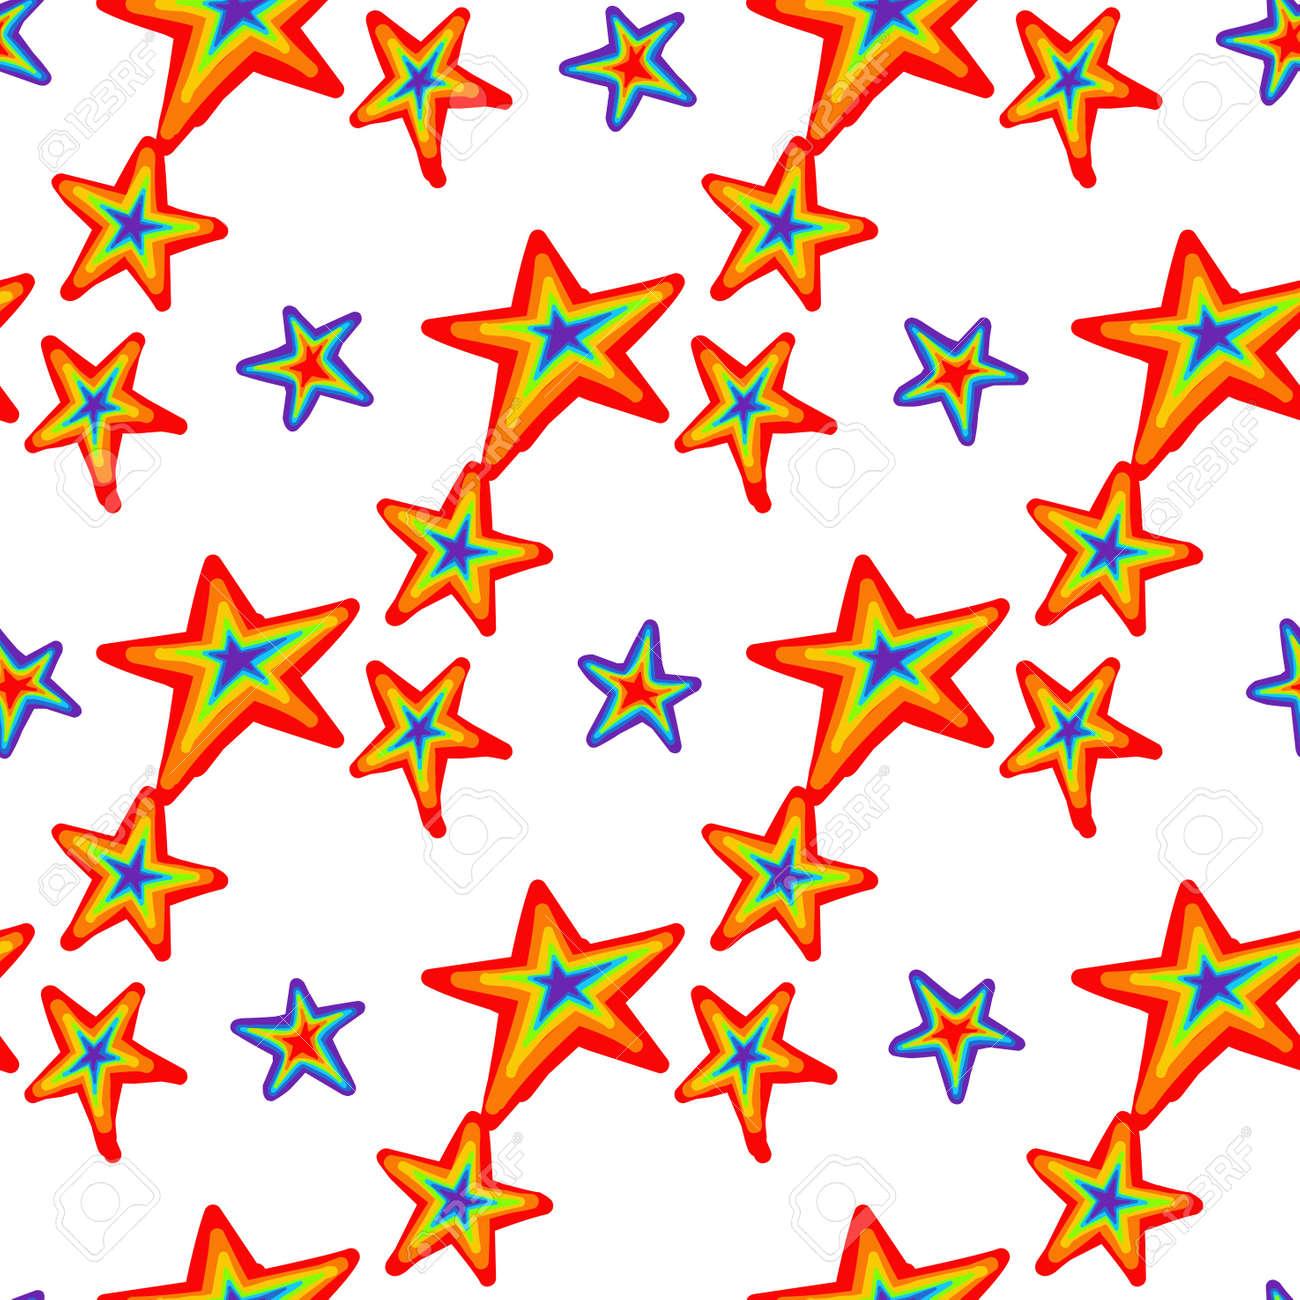 rainbow pattern. Bright summer pattern seamless. Summer trending design. Summer 2021.gay pride colors. lgbt. - 169770398